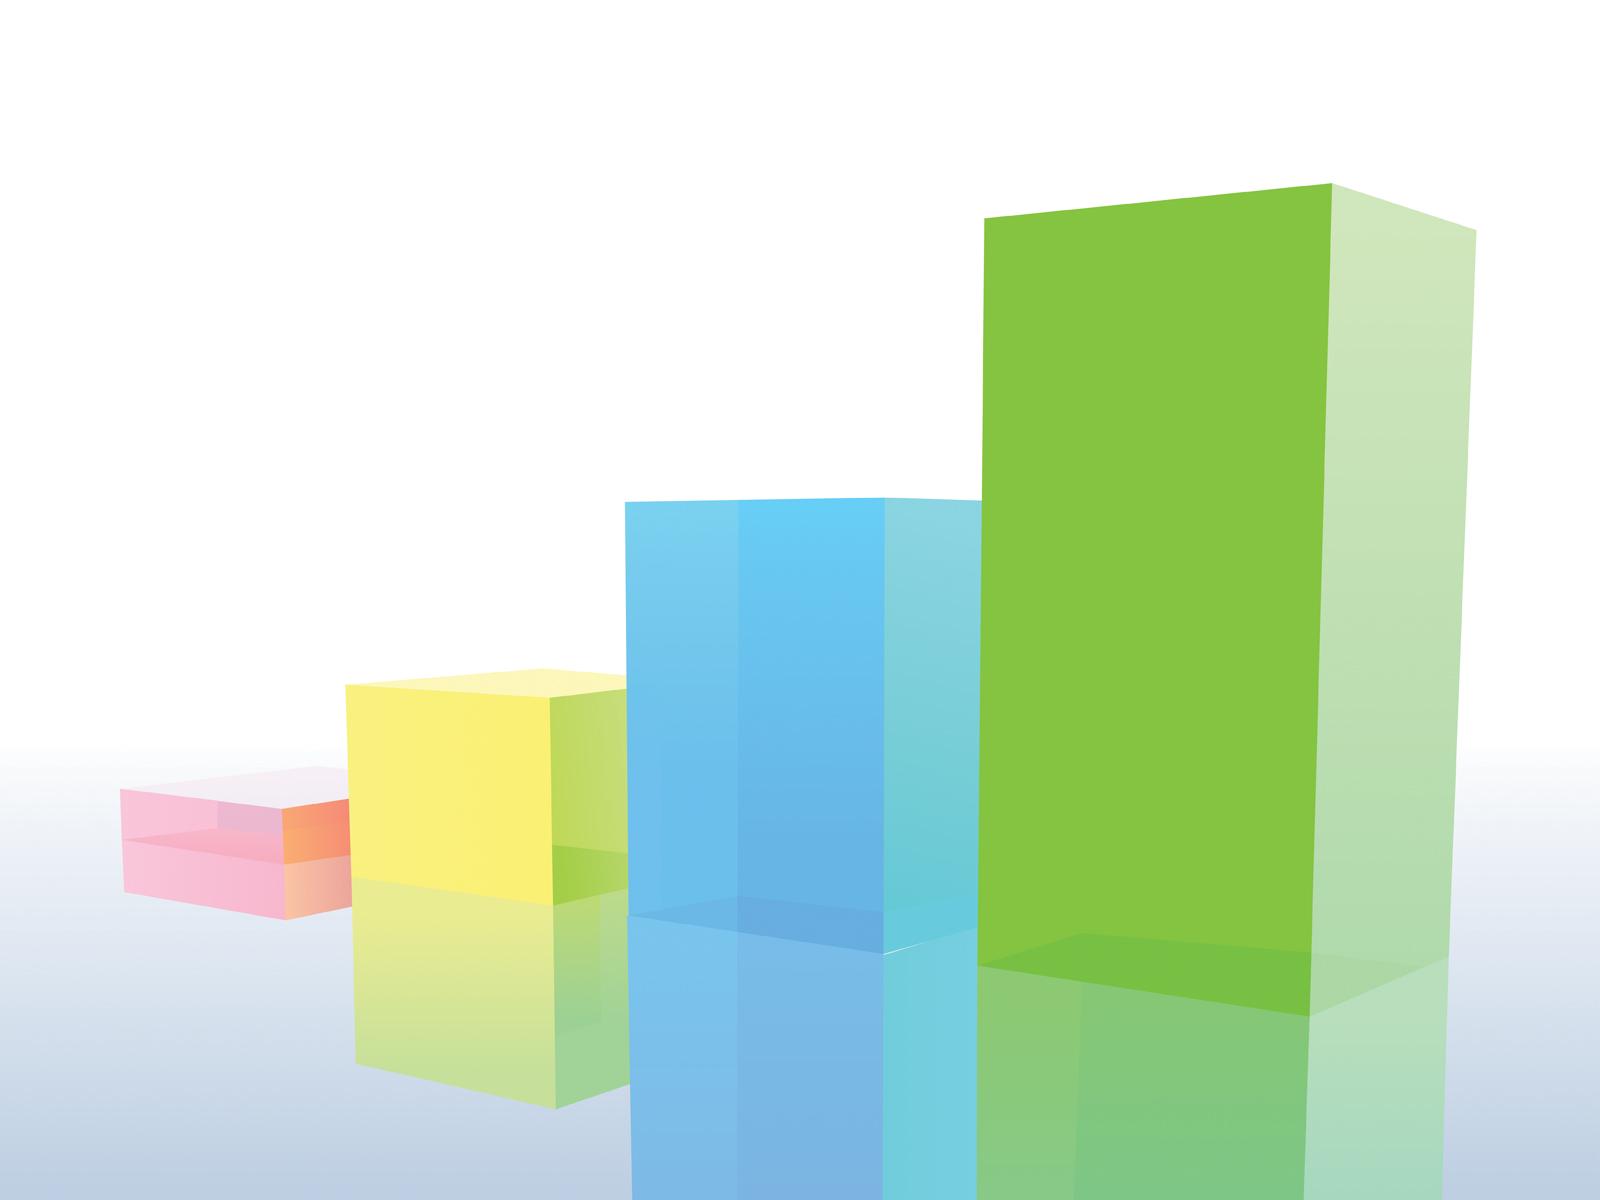 Business-Grafix-Powerpoint-Charts.jpg